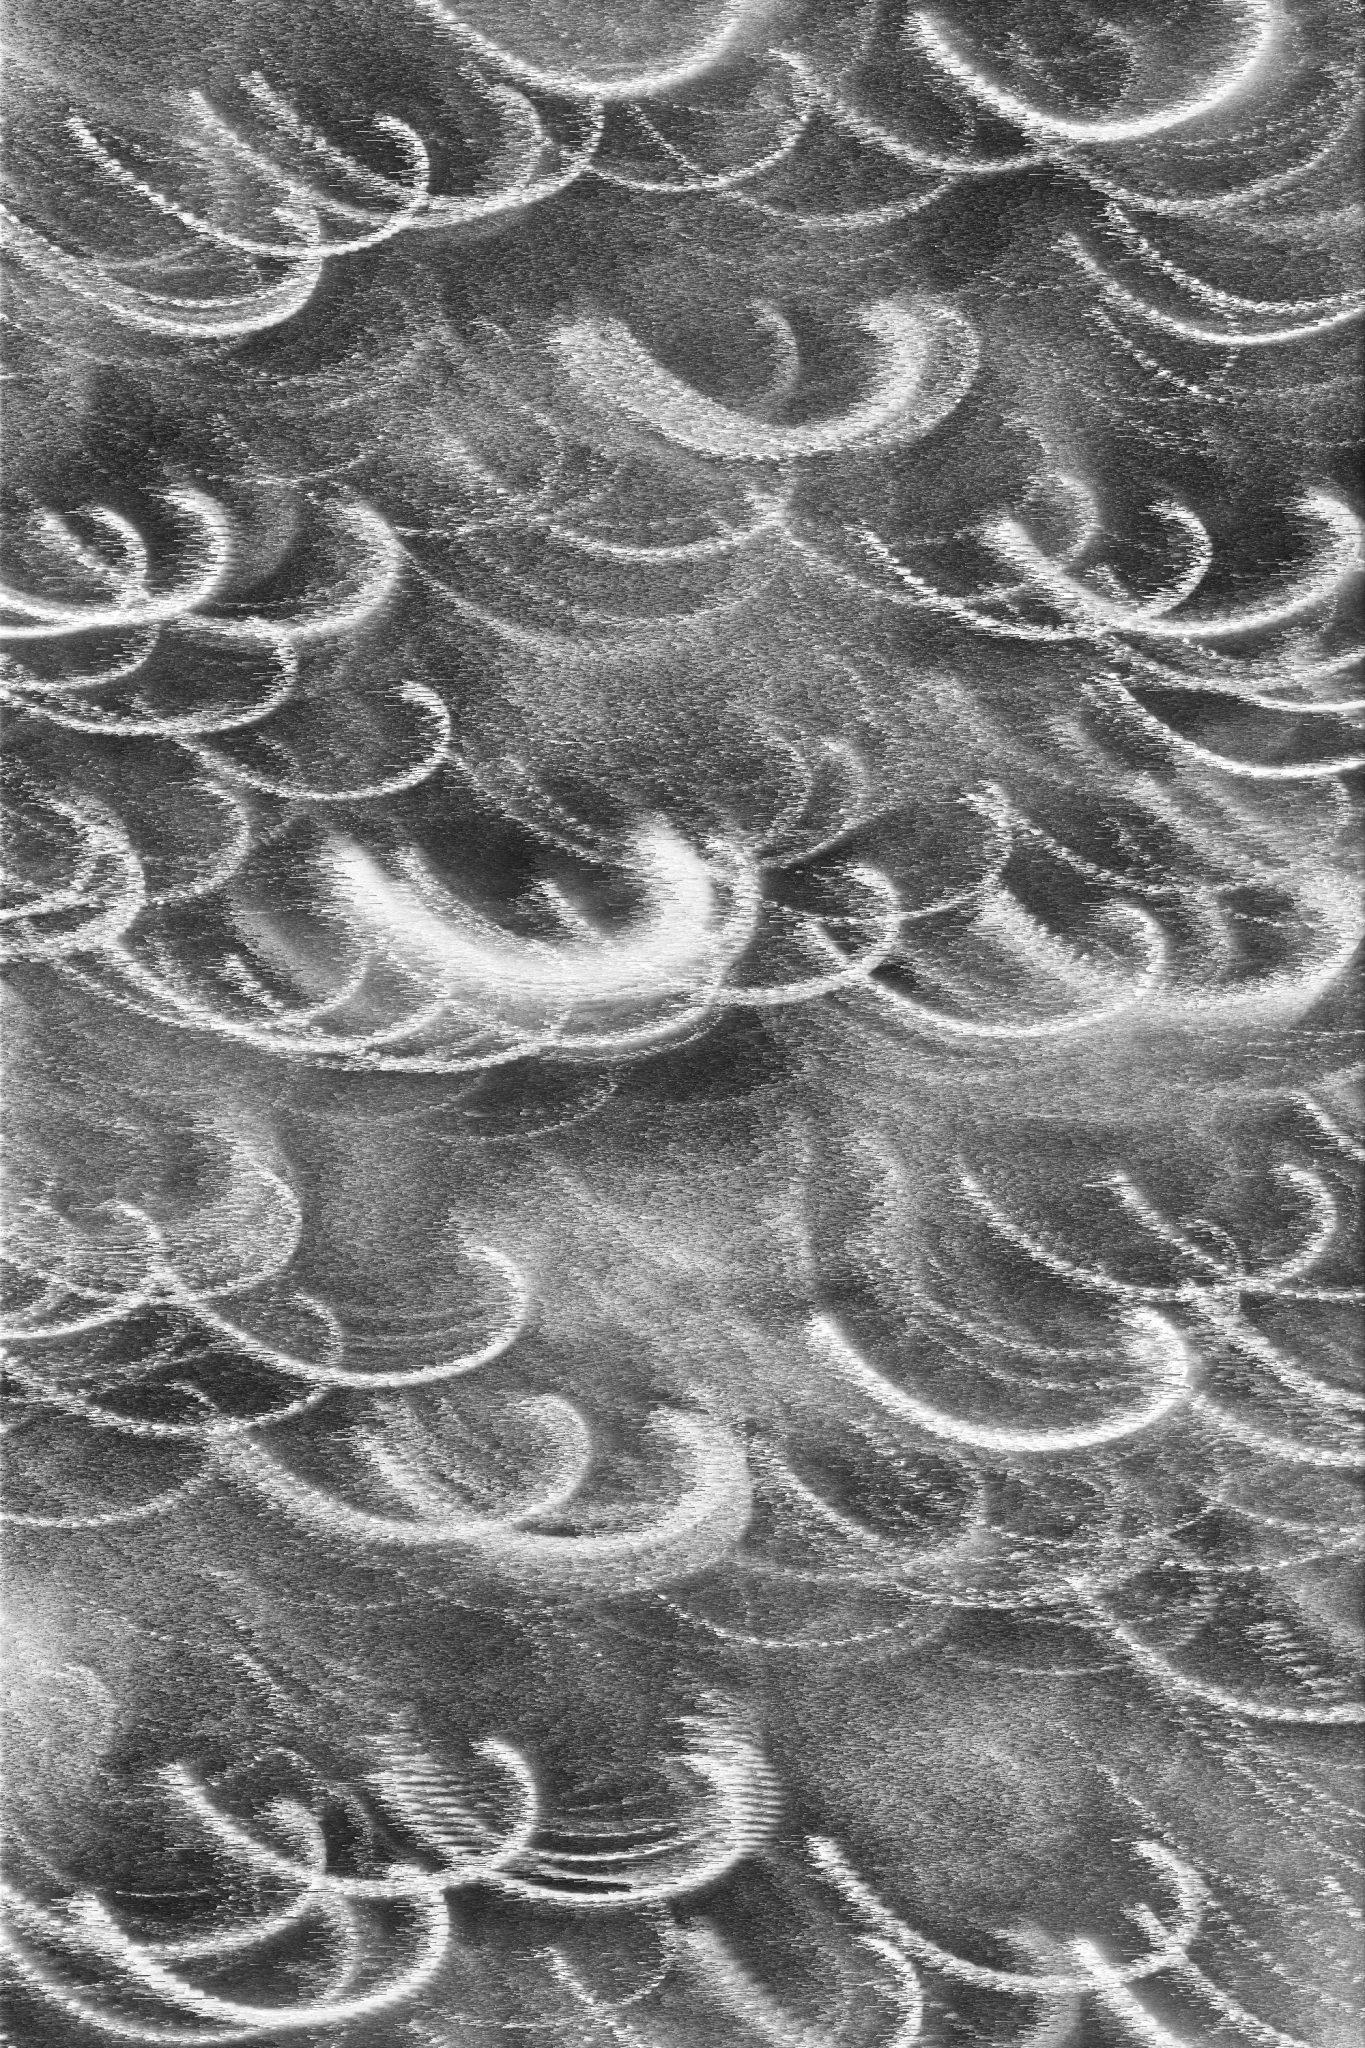 Schematic Impulse 𝑏𝑦 Jon Chaiim McConnell